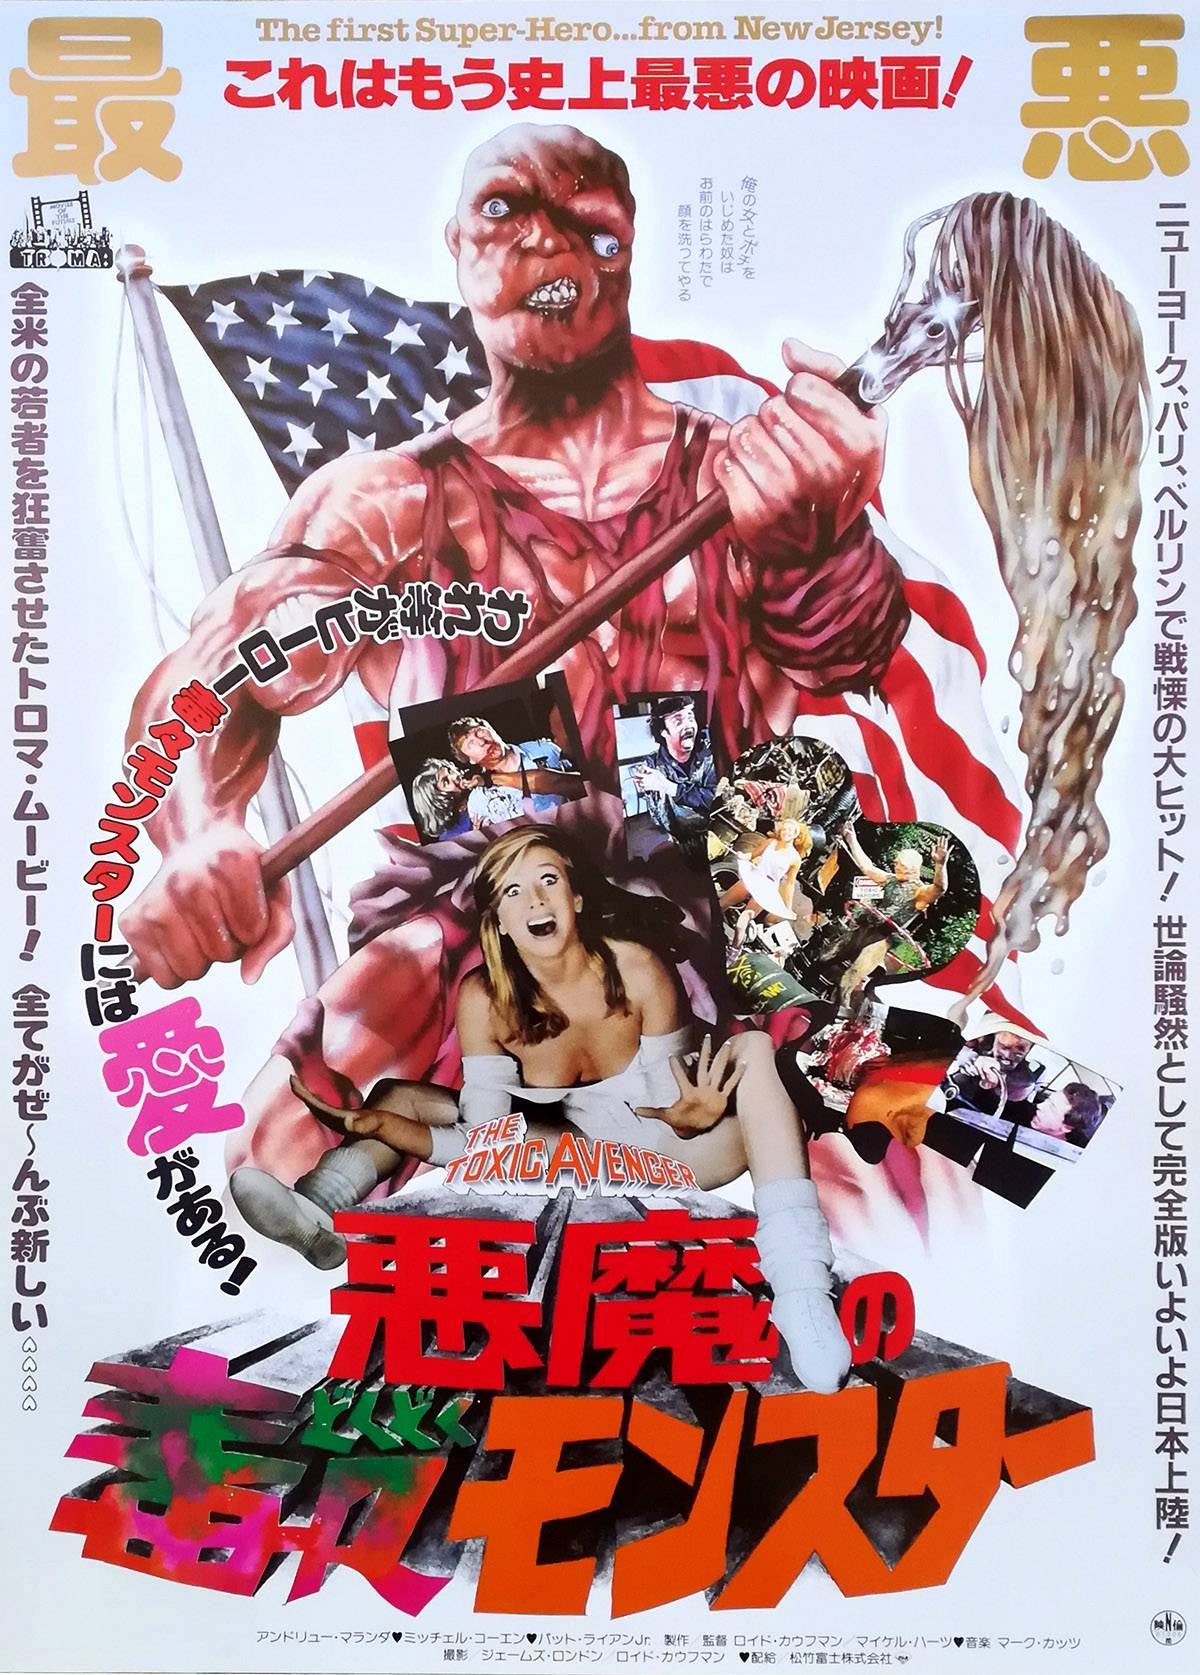 Votre top10 des films d'horreur Toxic-avengers-japanese-b2-movie-poster-20x28-in-lloyd-kaufman-troma